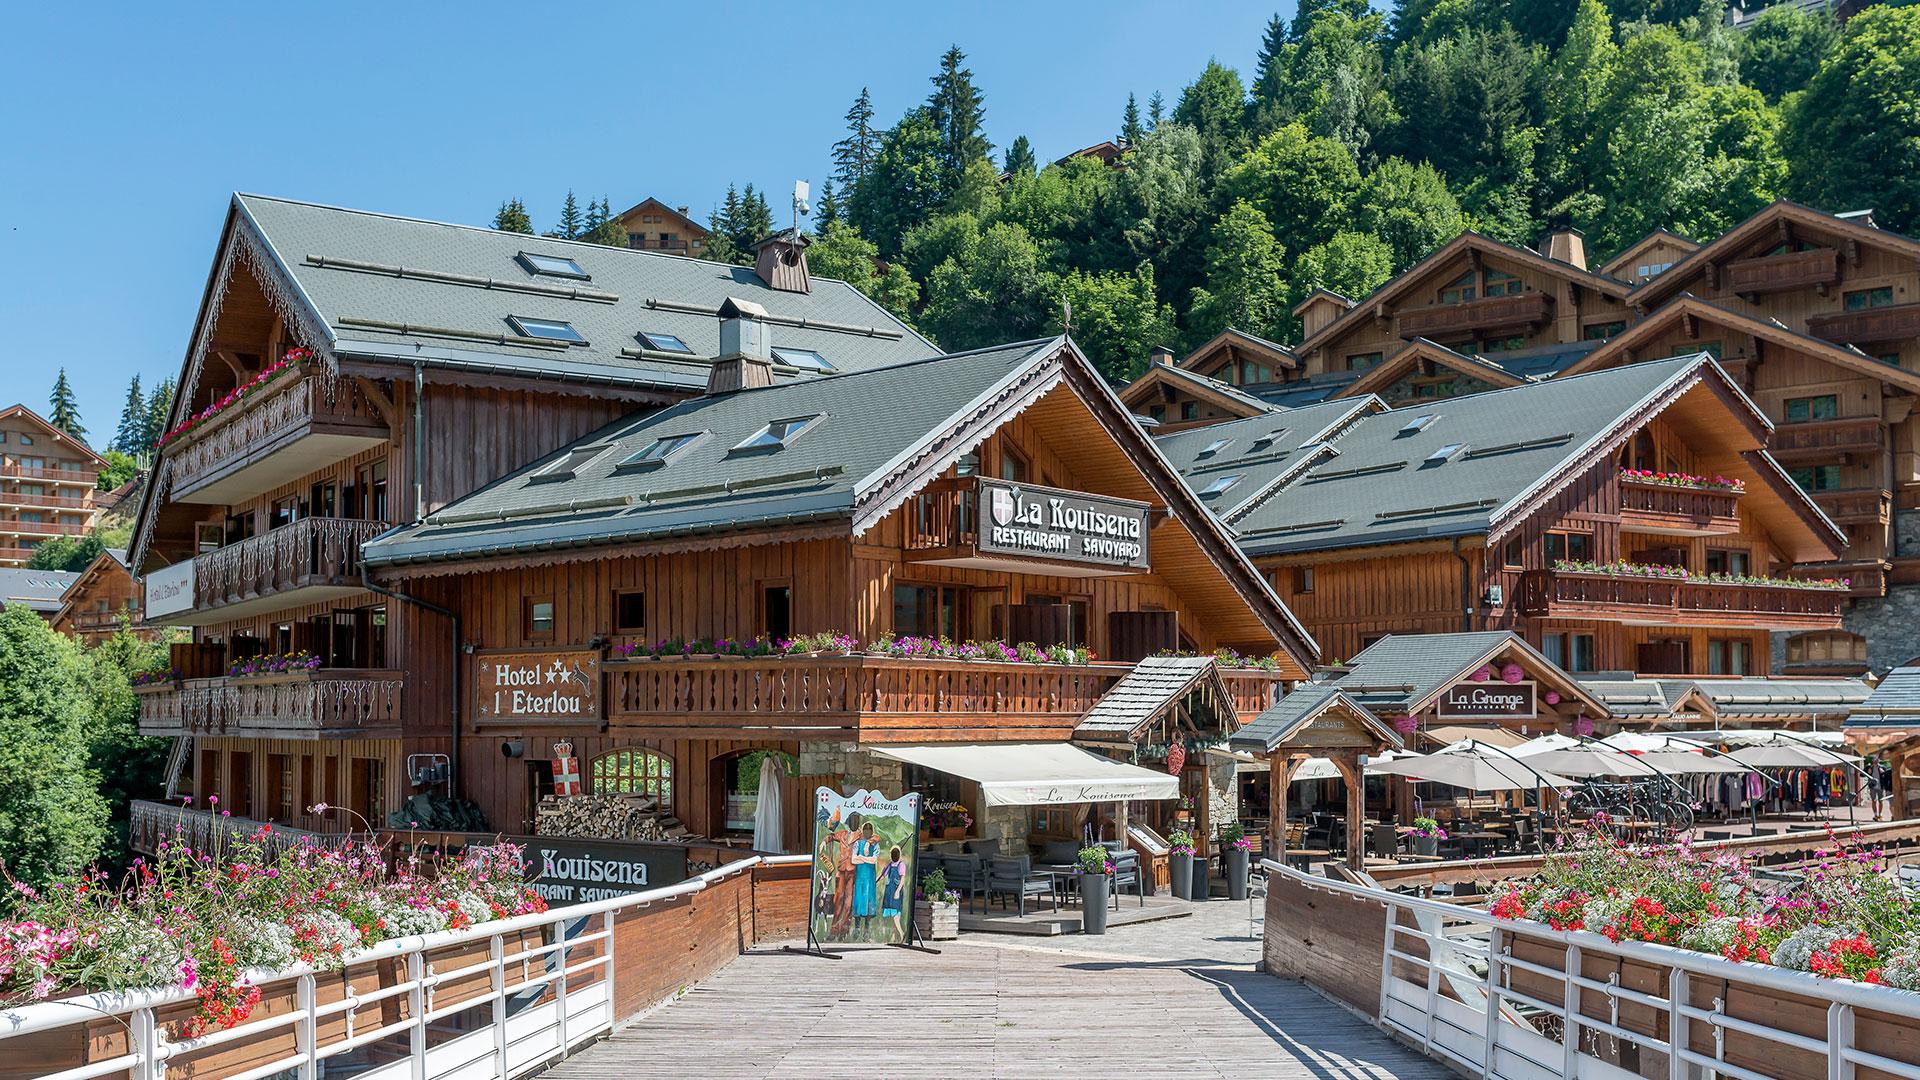 Ville de Méribel hôtel ski alpes